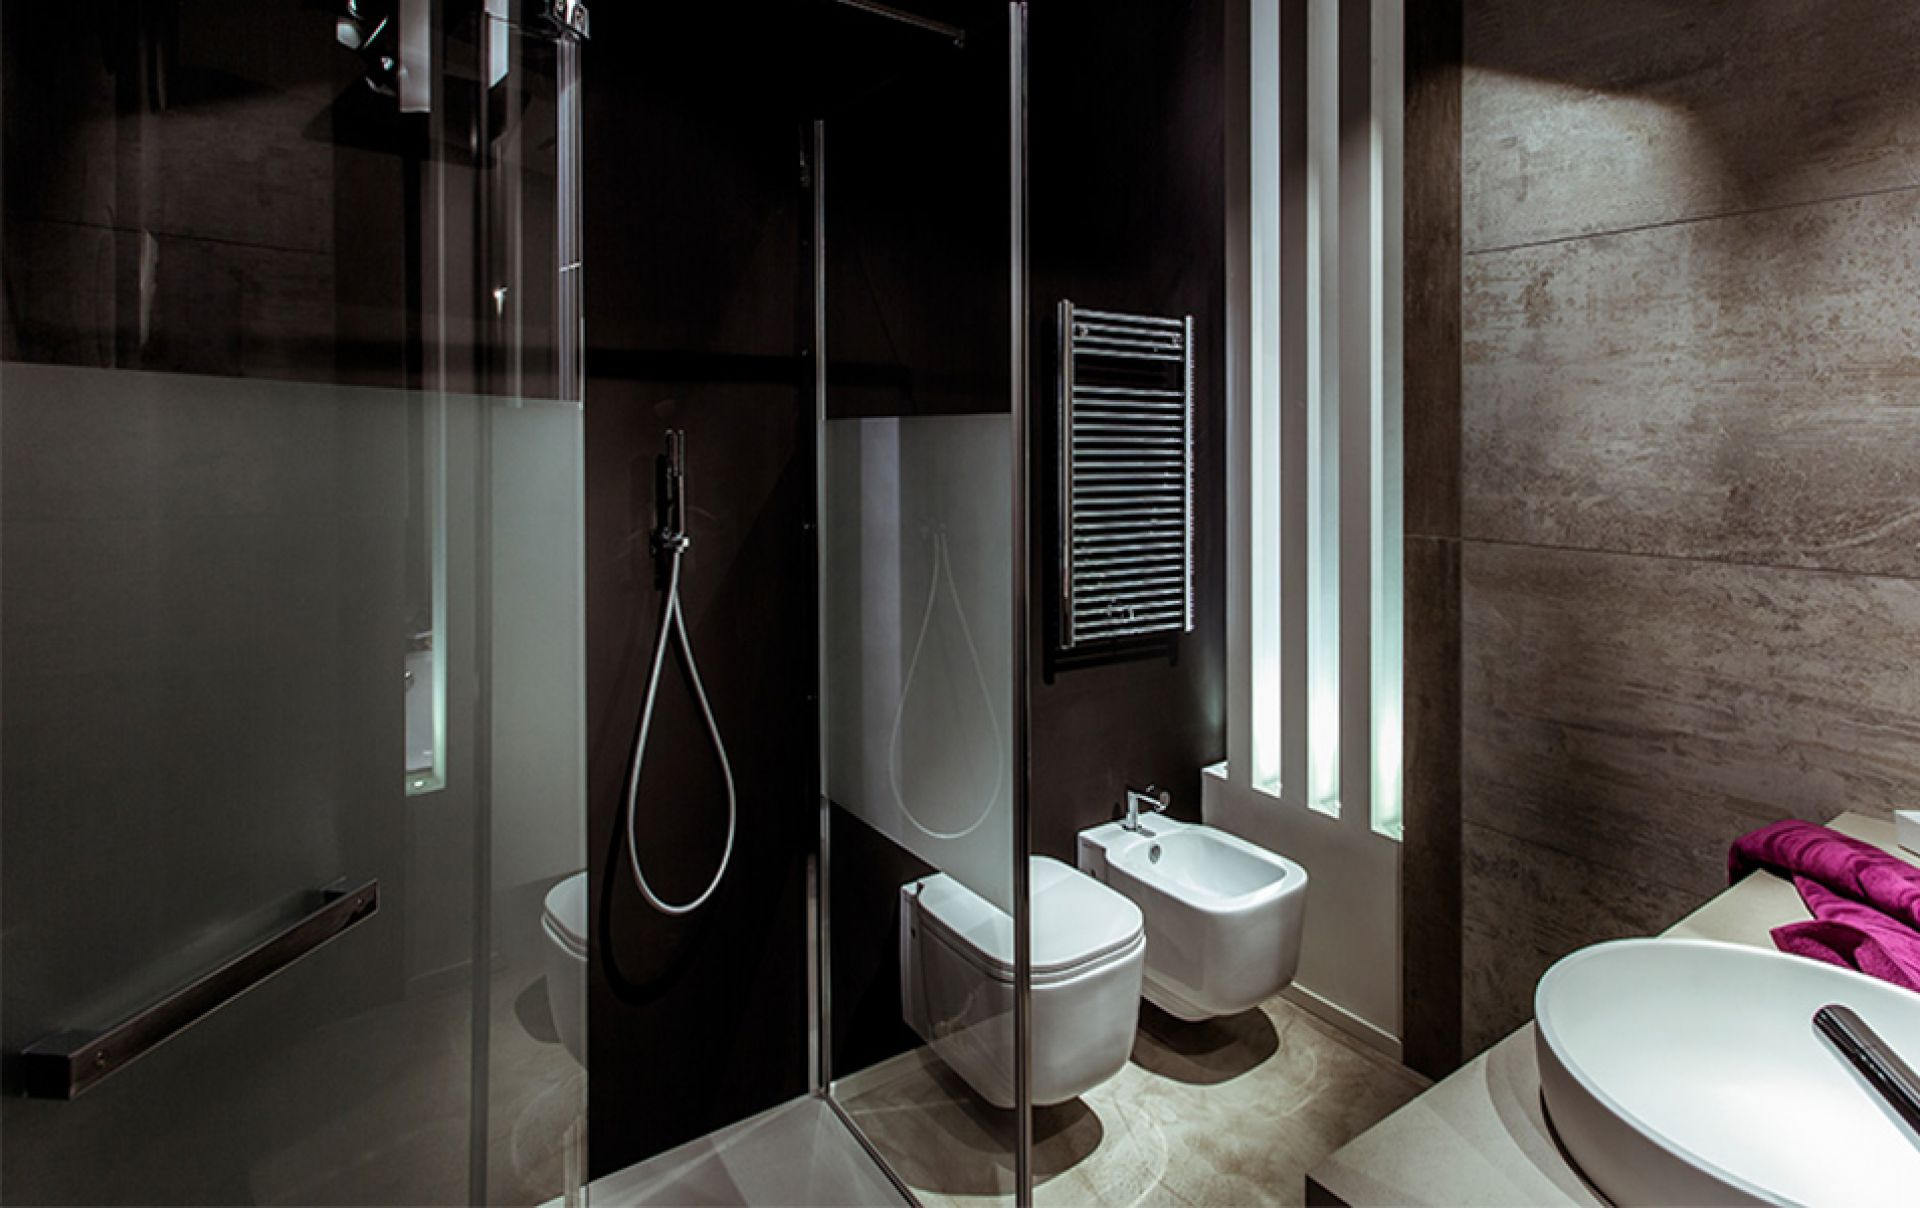 sanitari bagno bergamo | abc interni - Arredo Bagno Sanitari